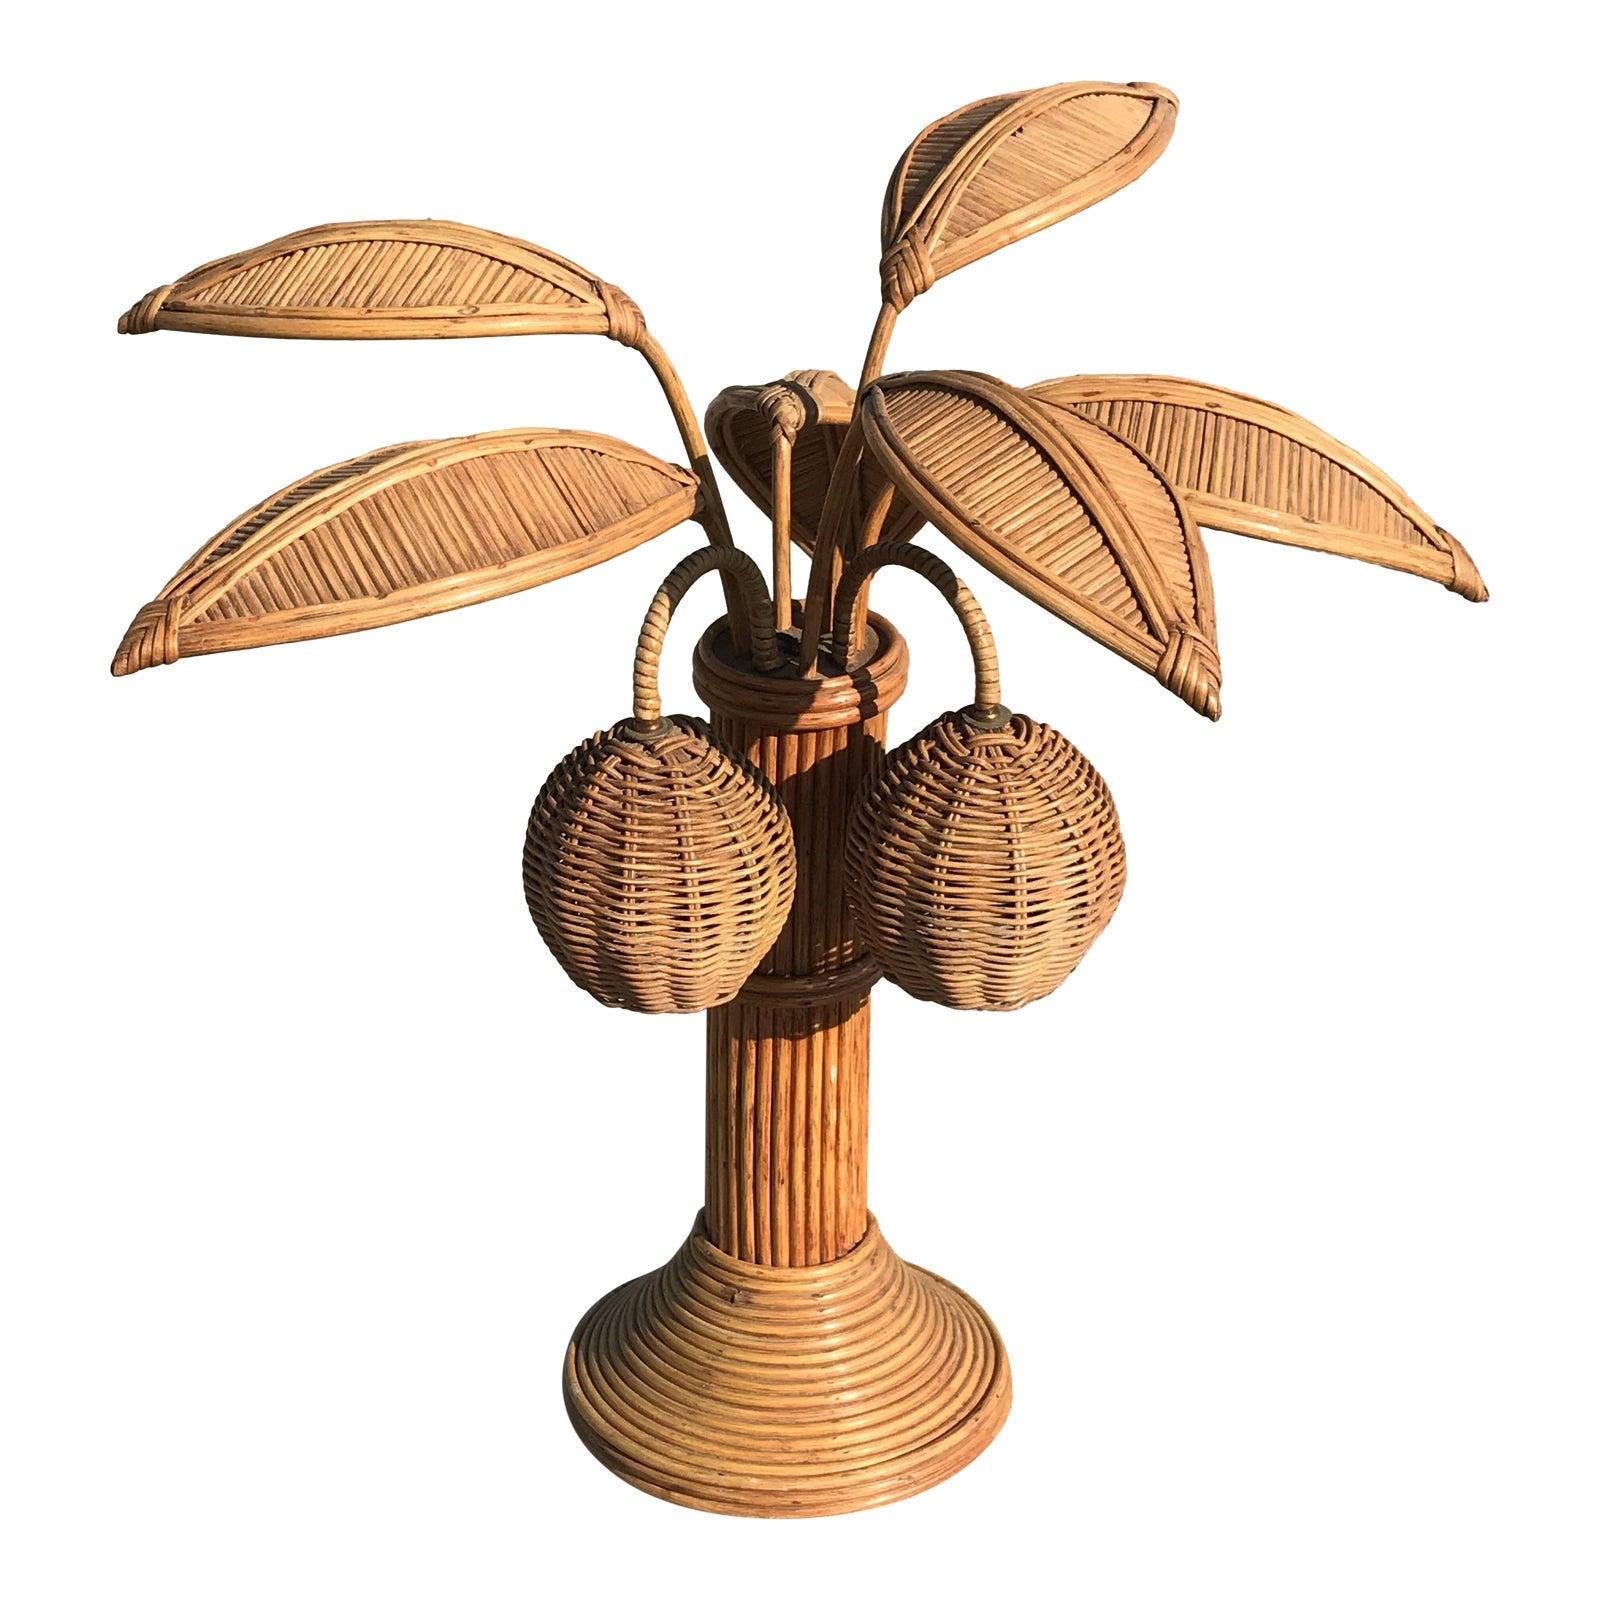 Mario Lopez Torres Rattan Palm Tree Table Lamp